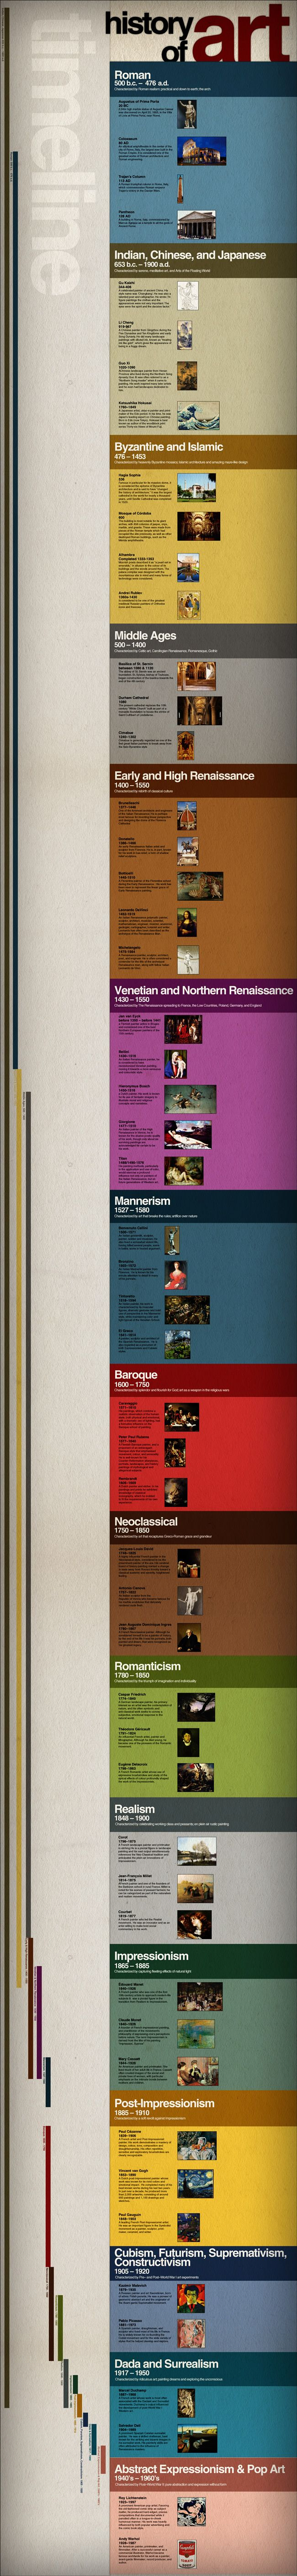 timeline history of #art